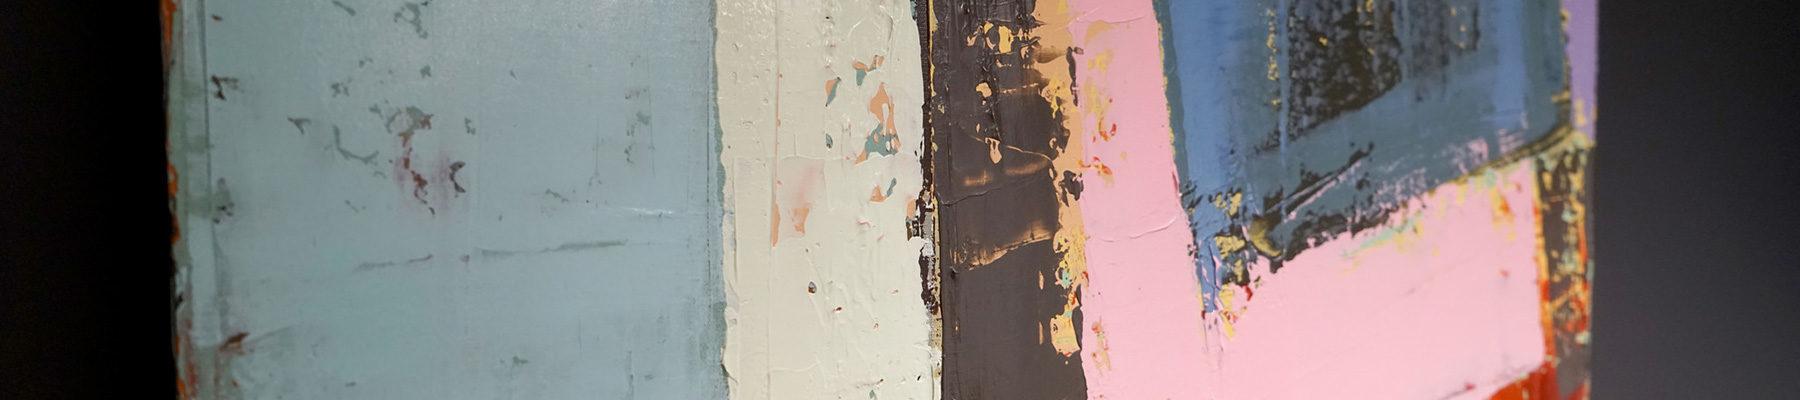 4 Walls No Window Painting